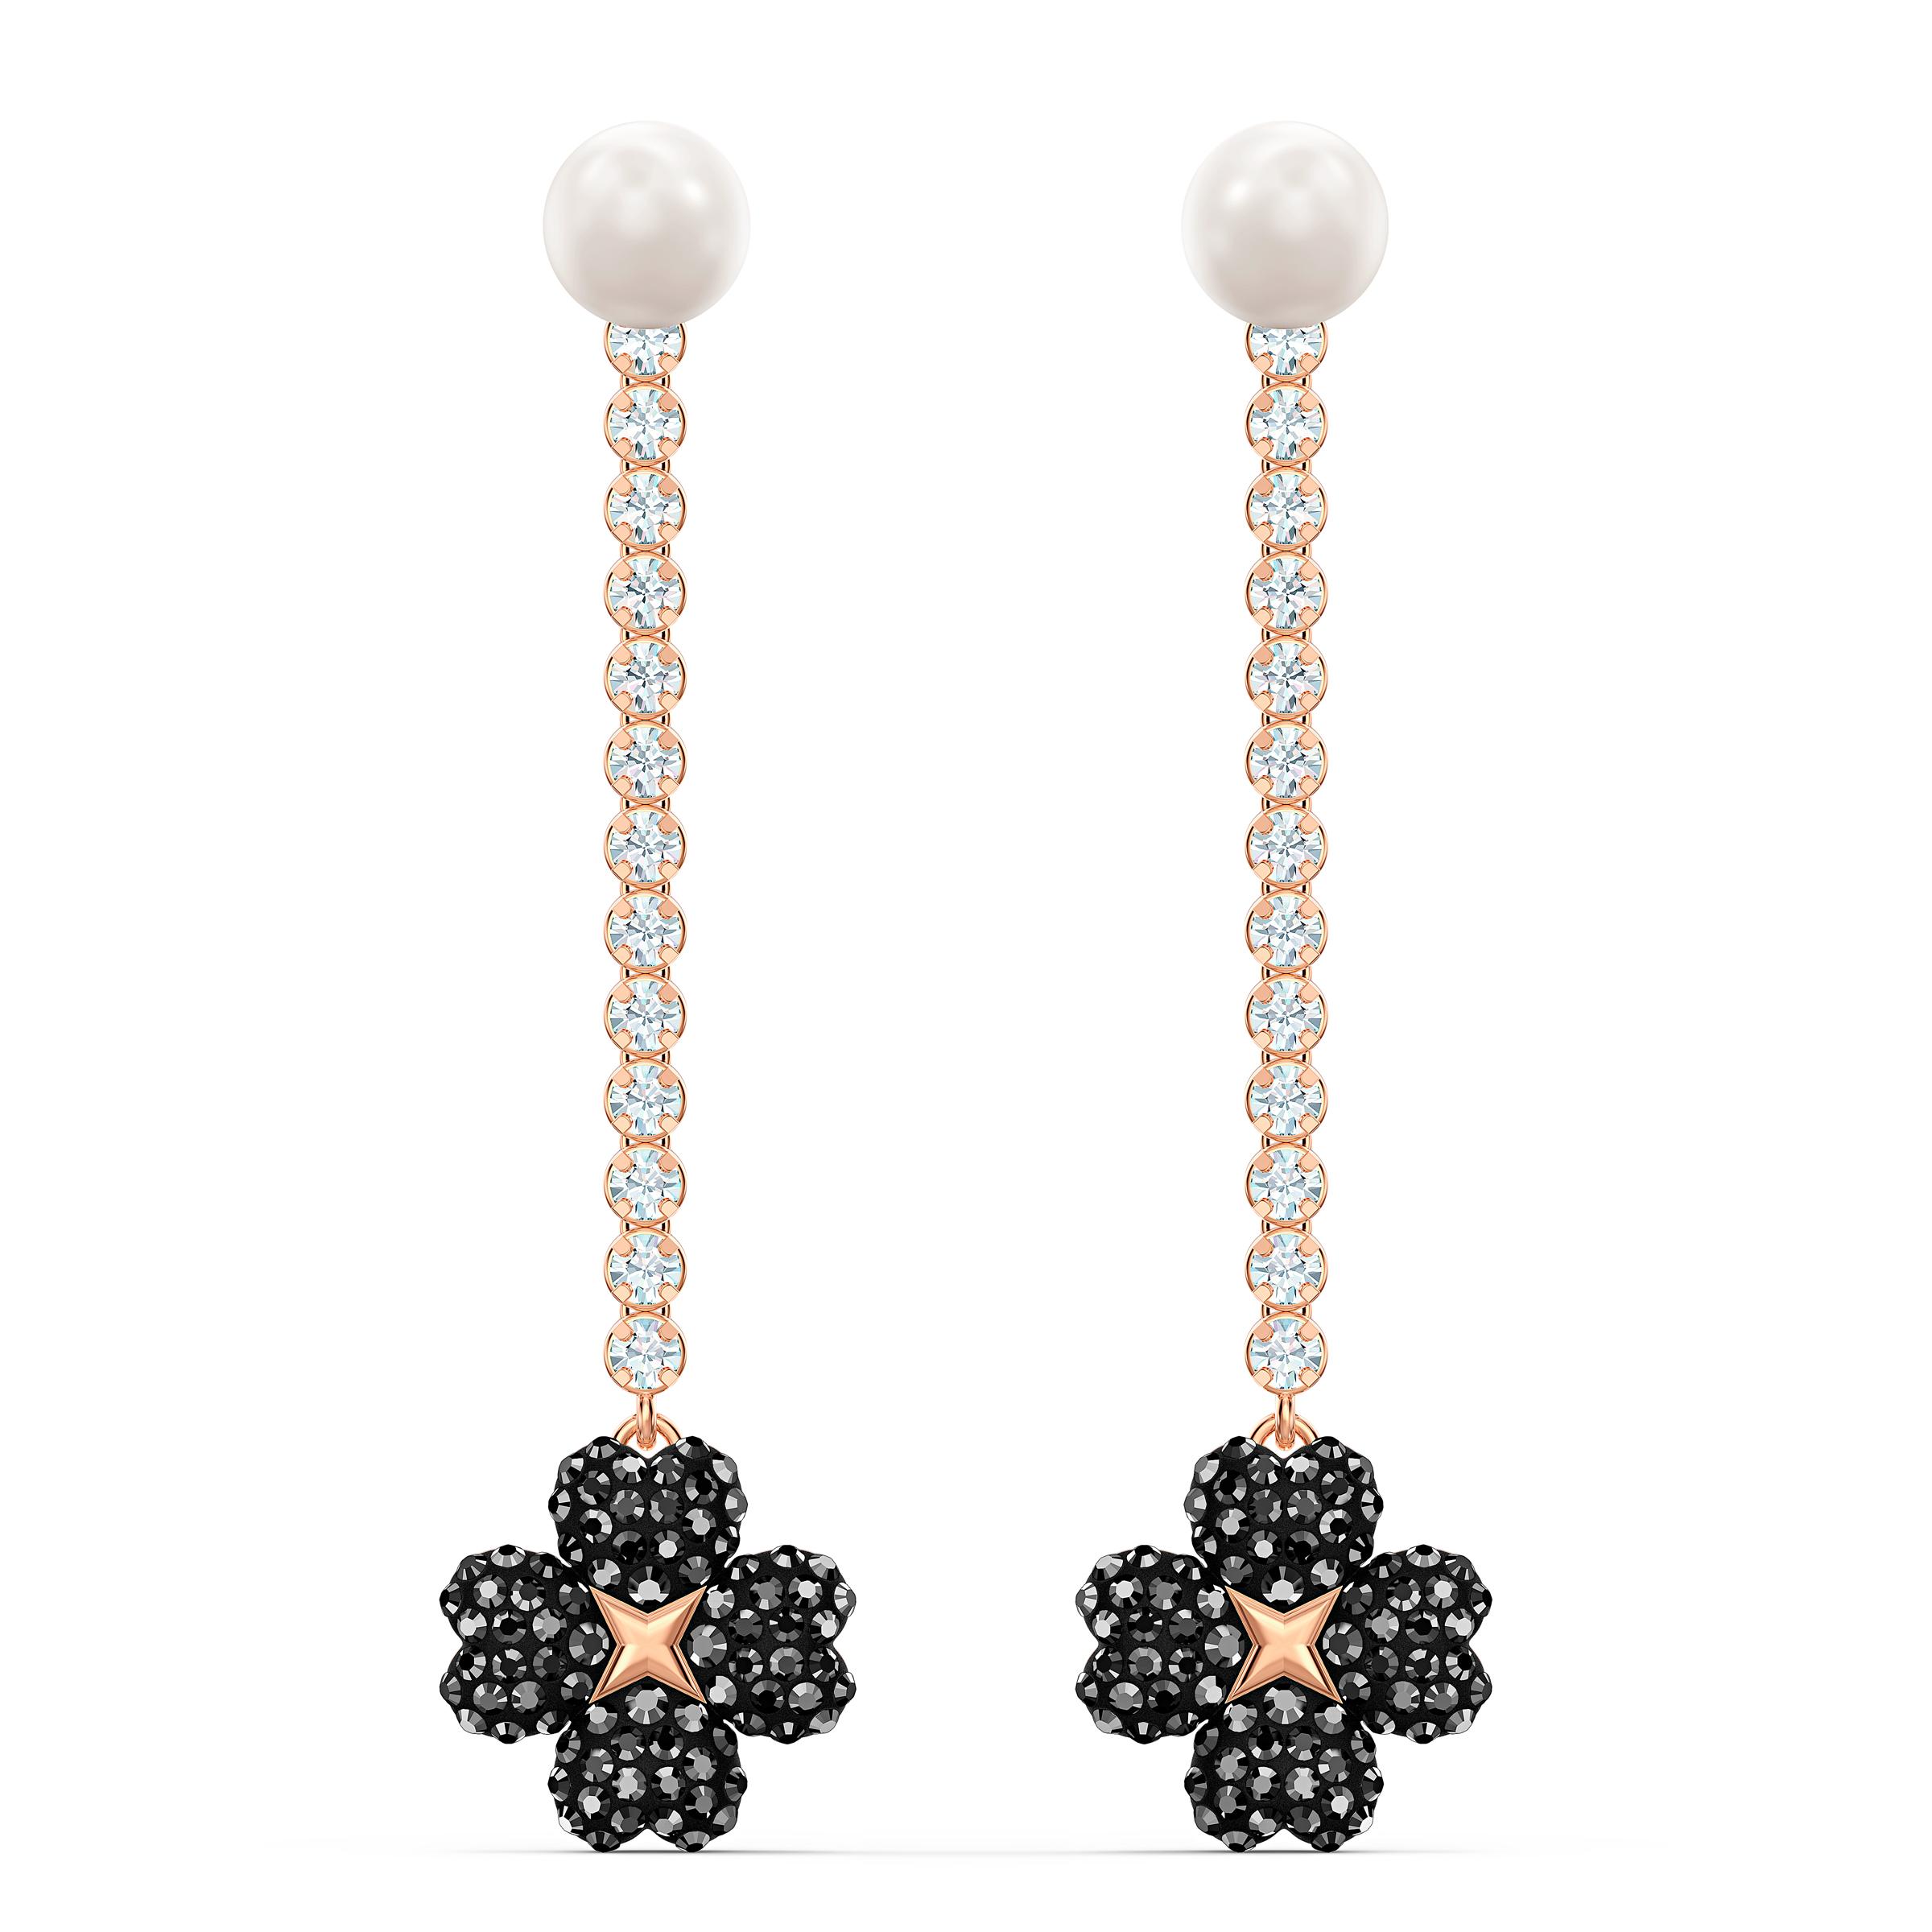 Boucles d'oreilles Latisha, noir, métal doré rose, Swarovski